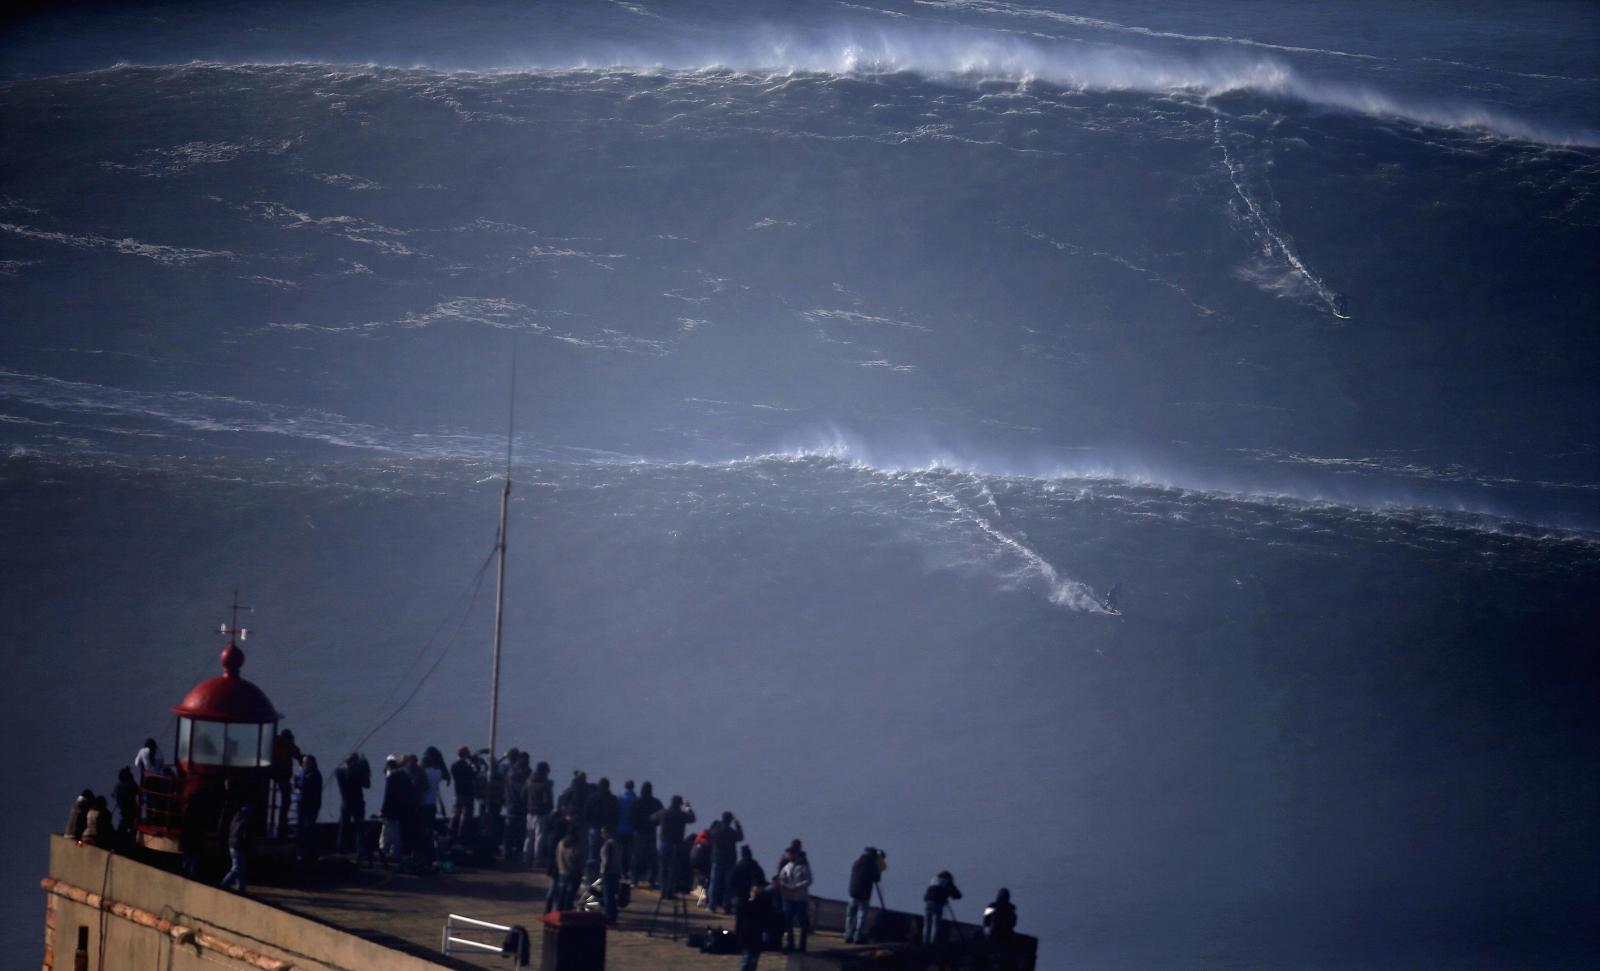 World's biggest waves